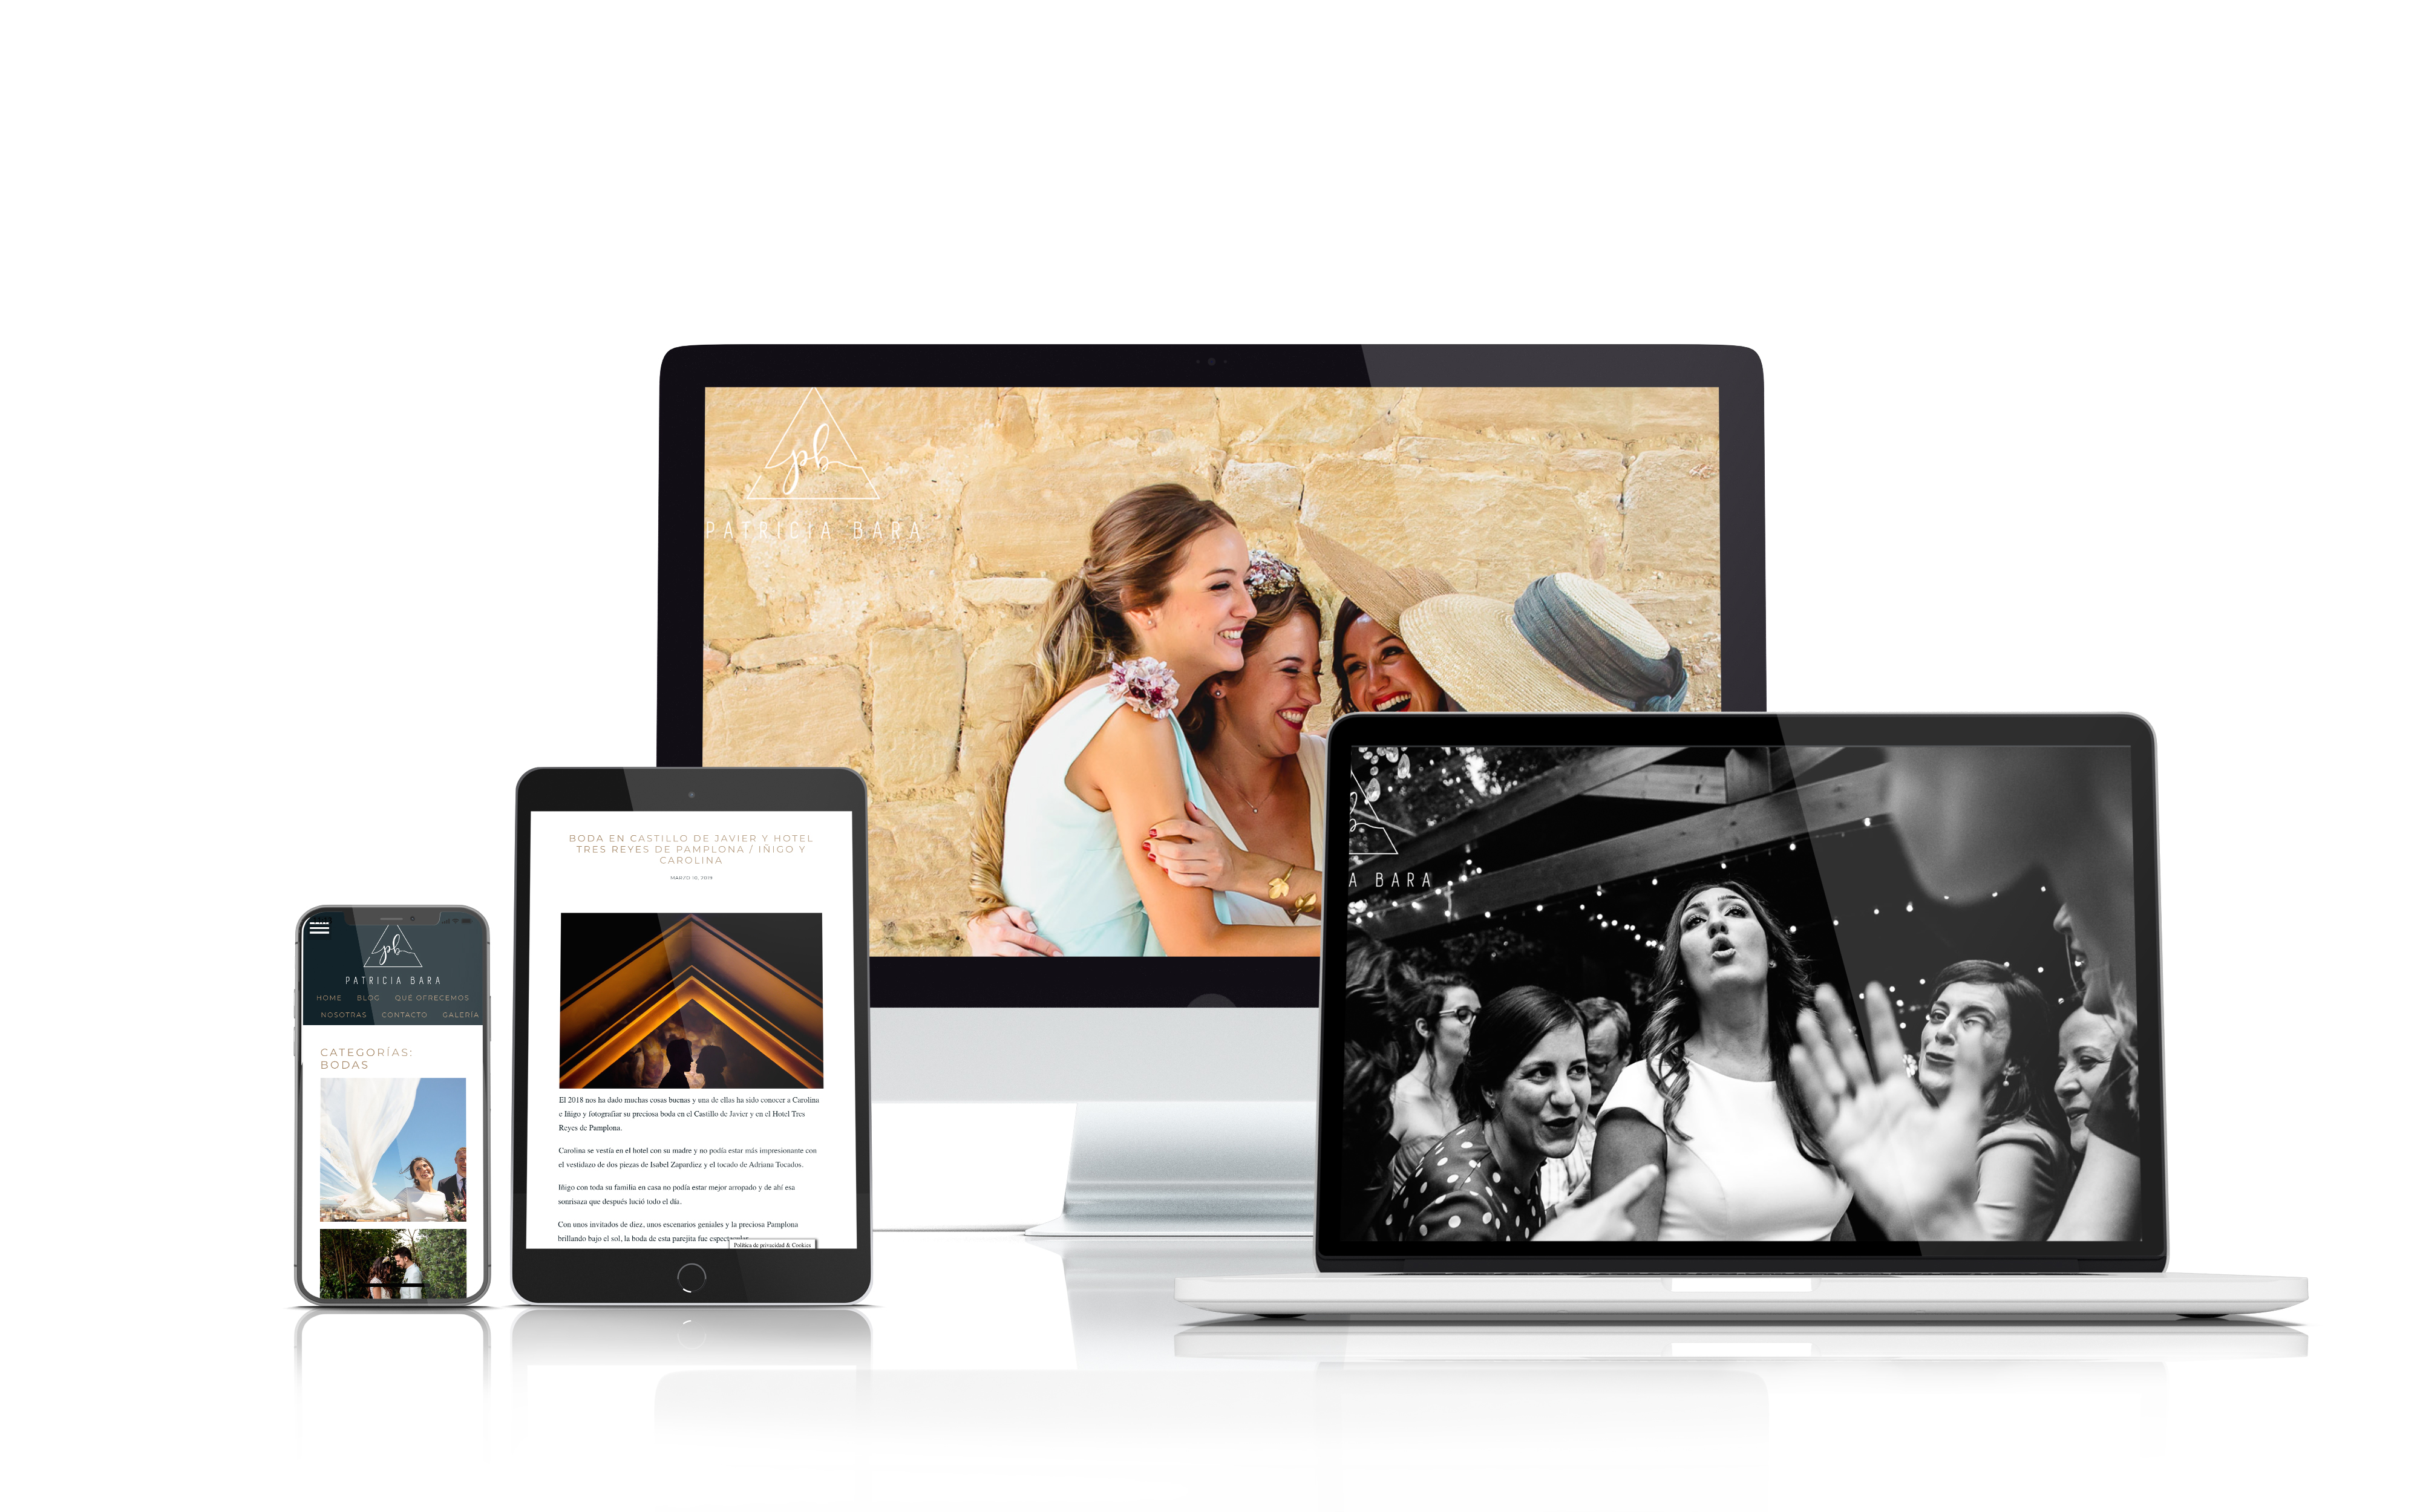 patricia-bara-mac-webs-para-fotografos